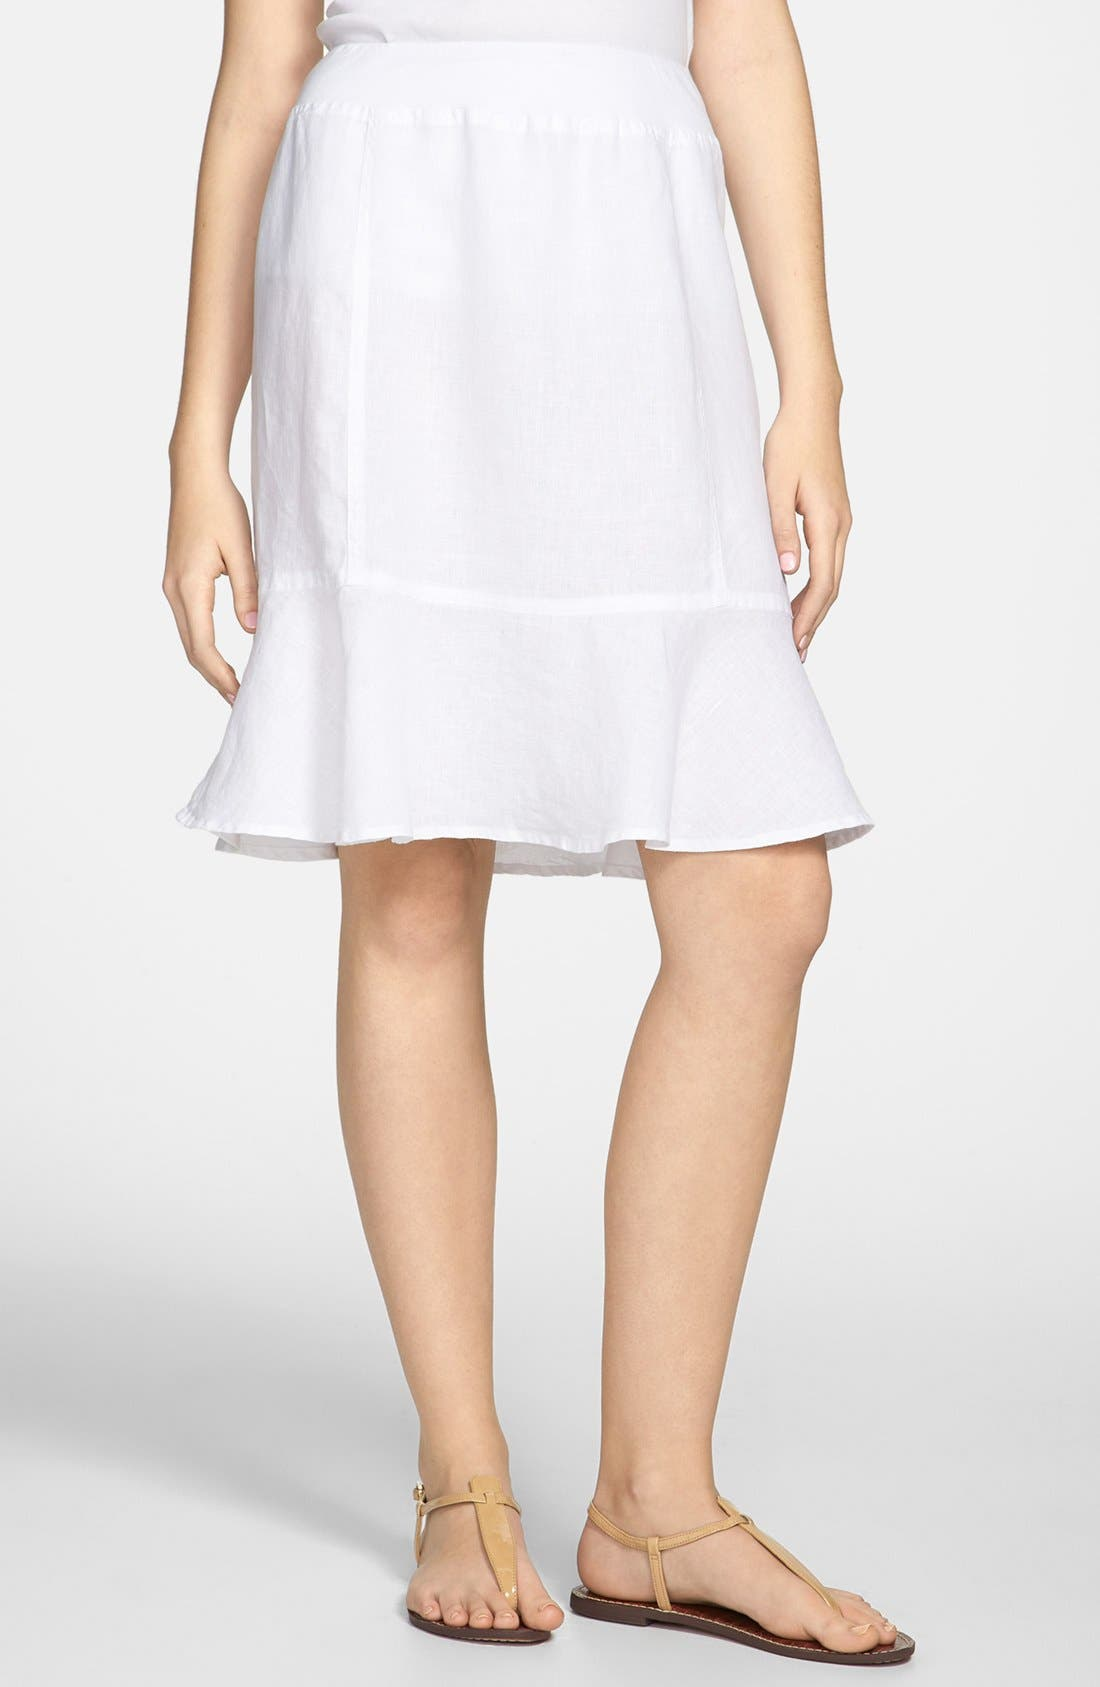 Alternate Image 1 Selected - Allen Allen Ruffle Hem Linen Skirt